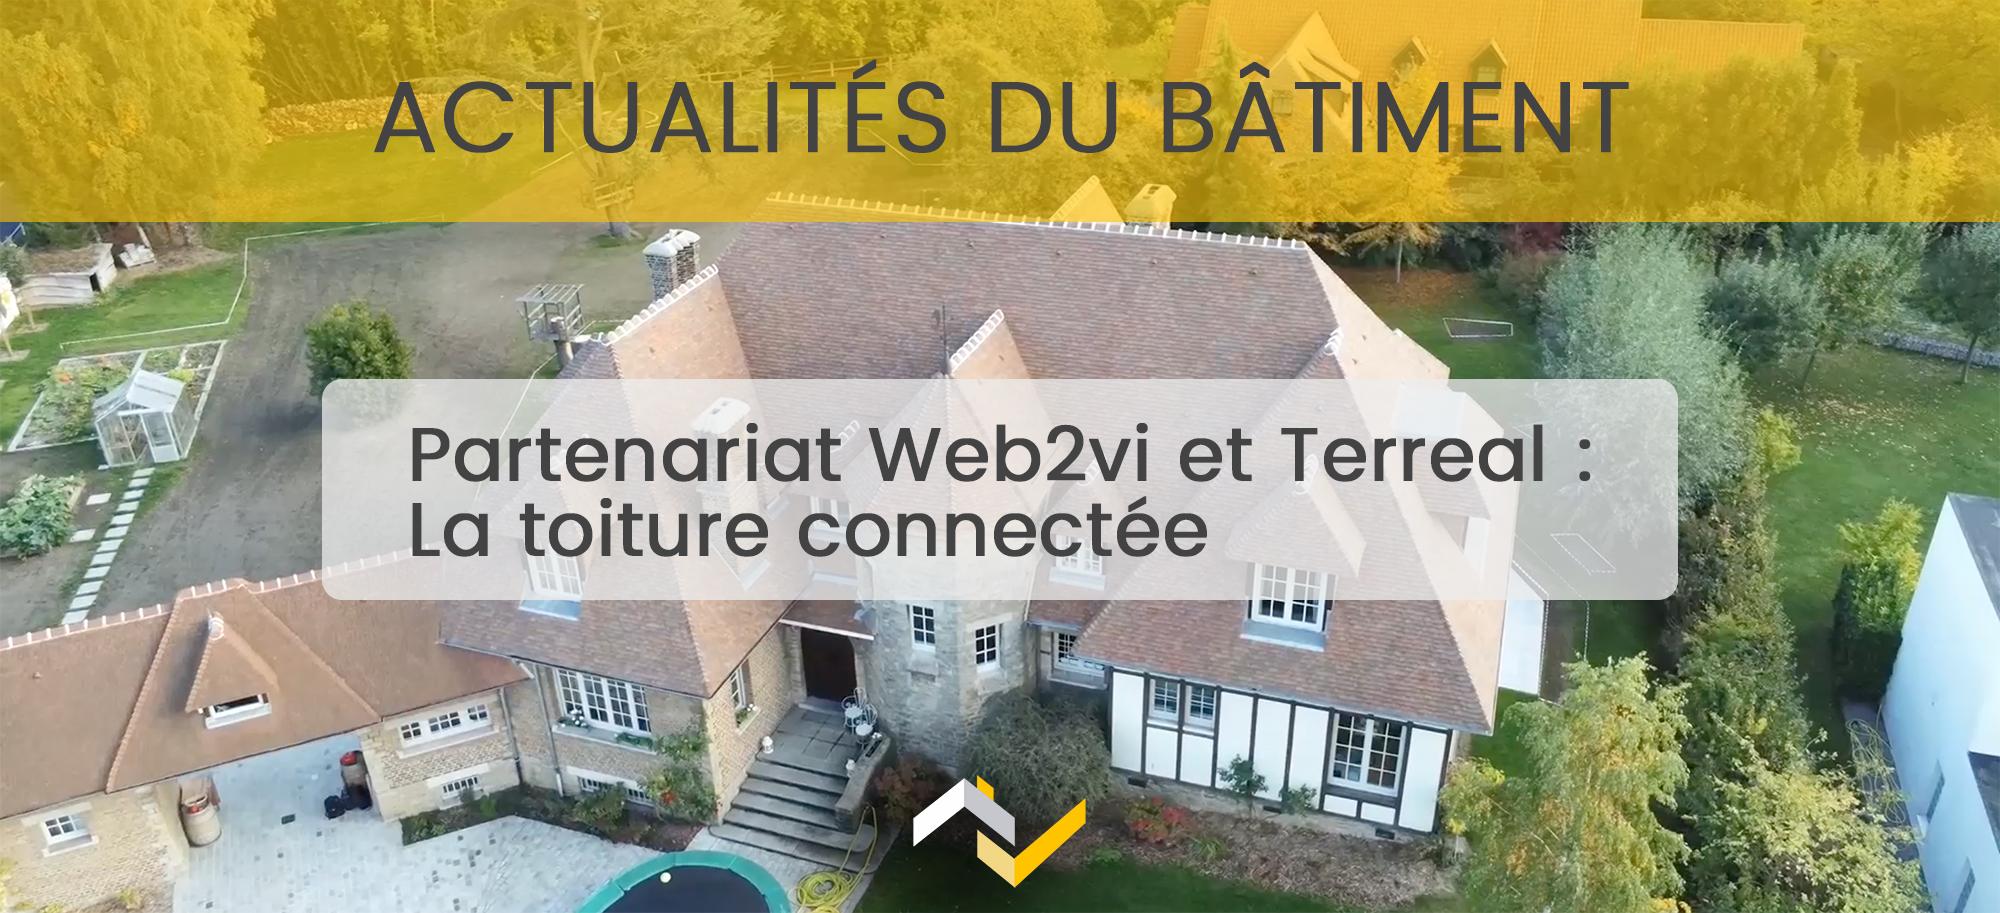 WEB2VI annonce son partenariat avec TERREAL